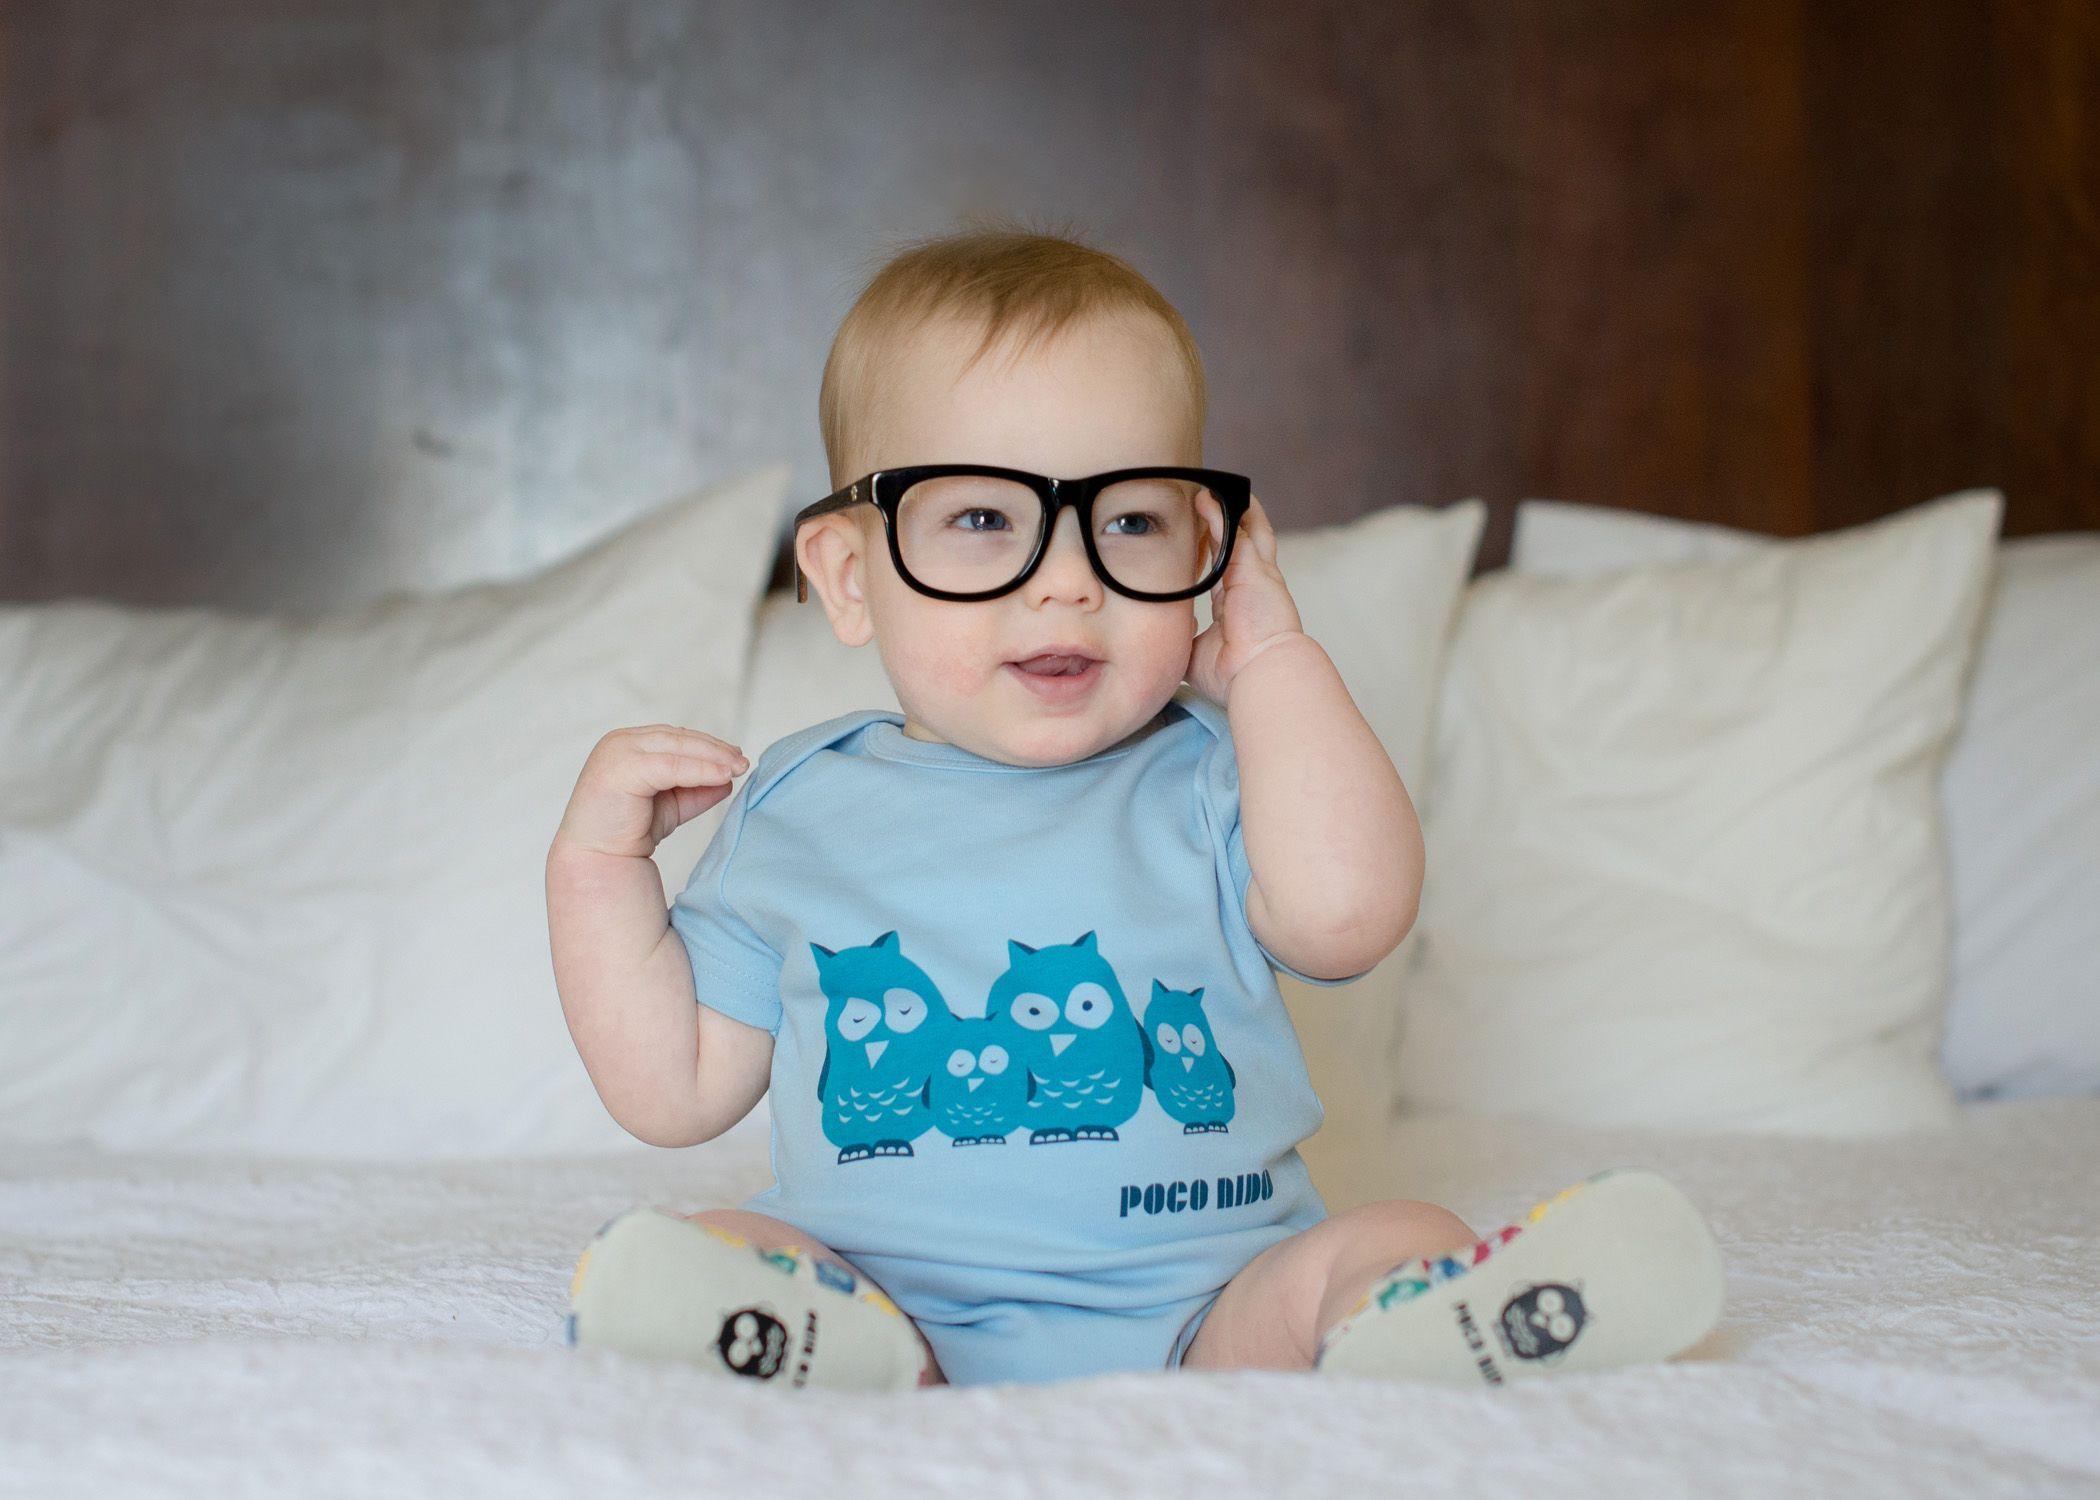 Poco Babyzimmer ~ Poco nido owls baby shoes and body suit poco nido